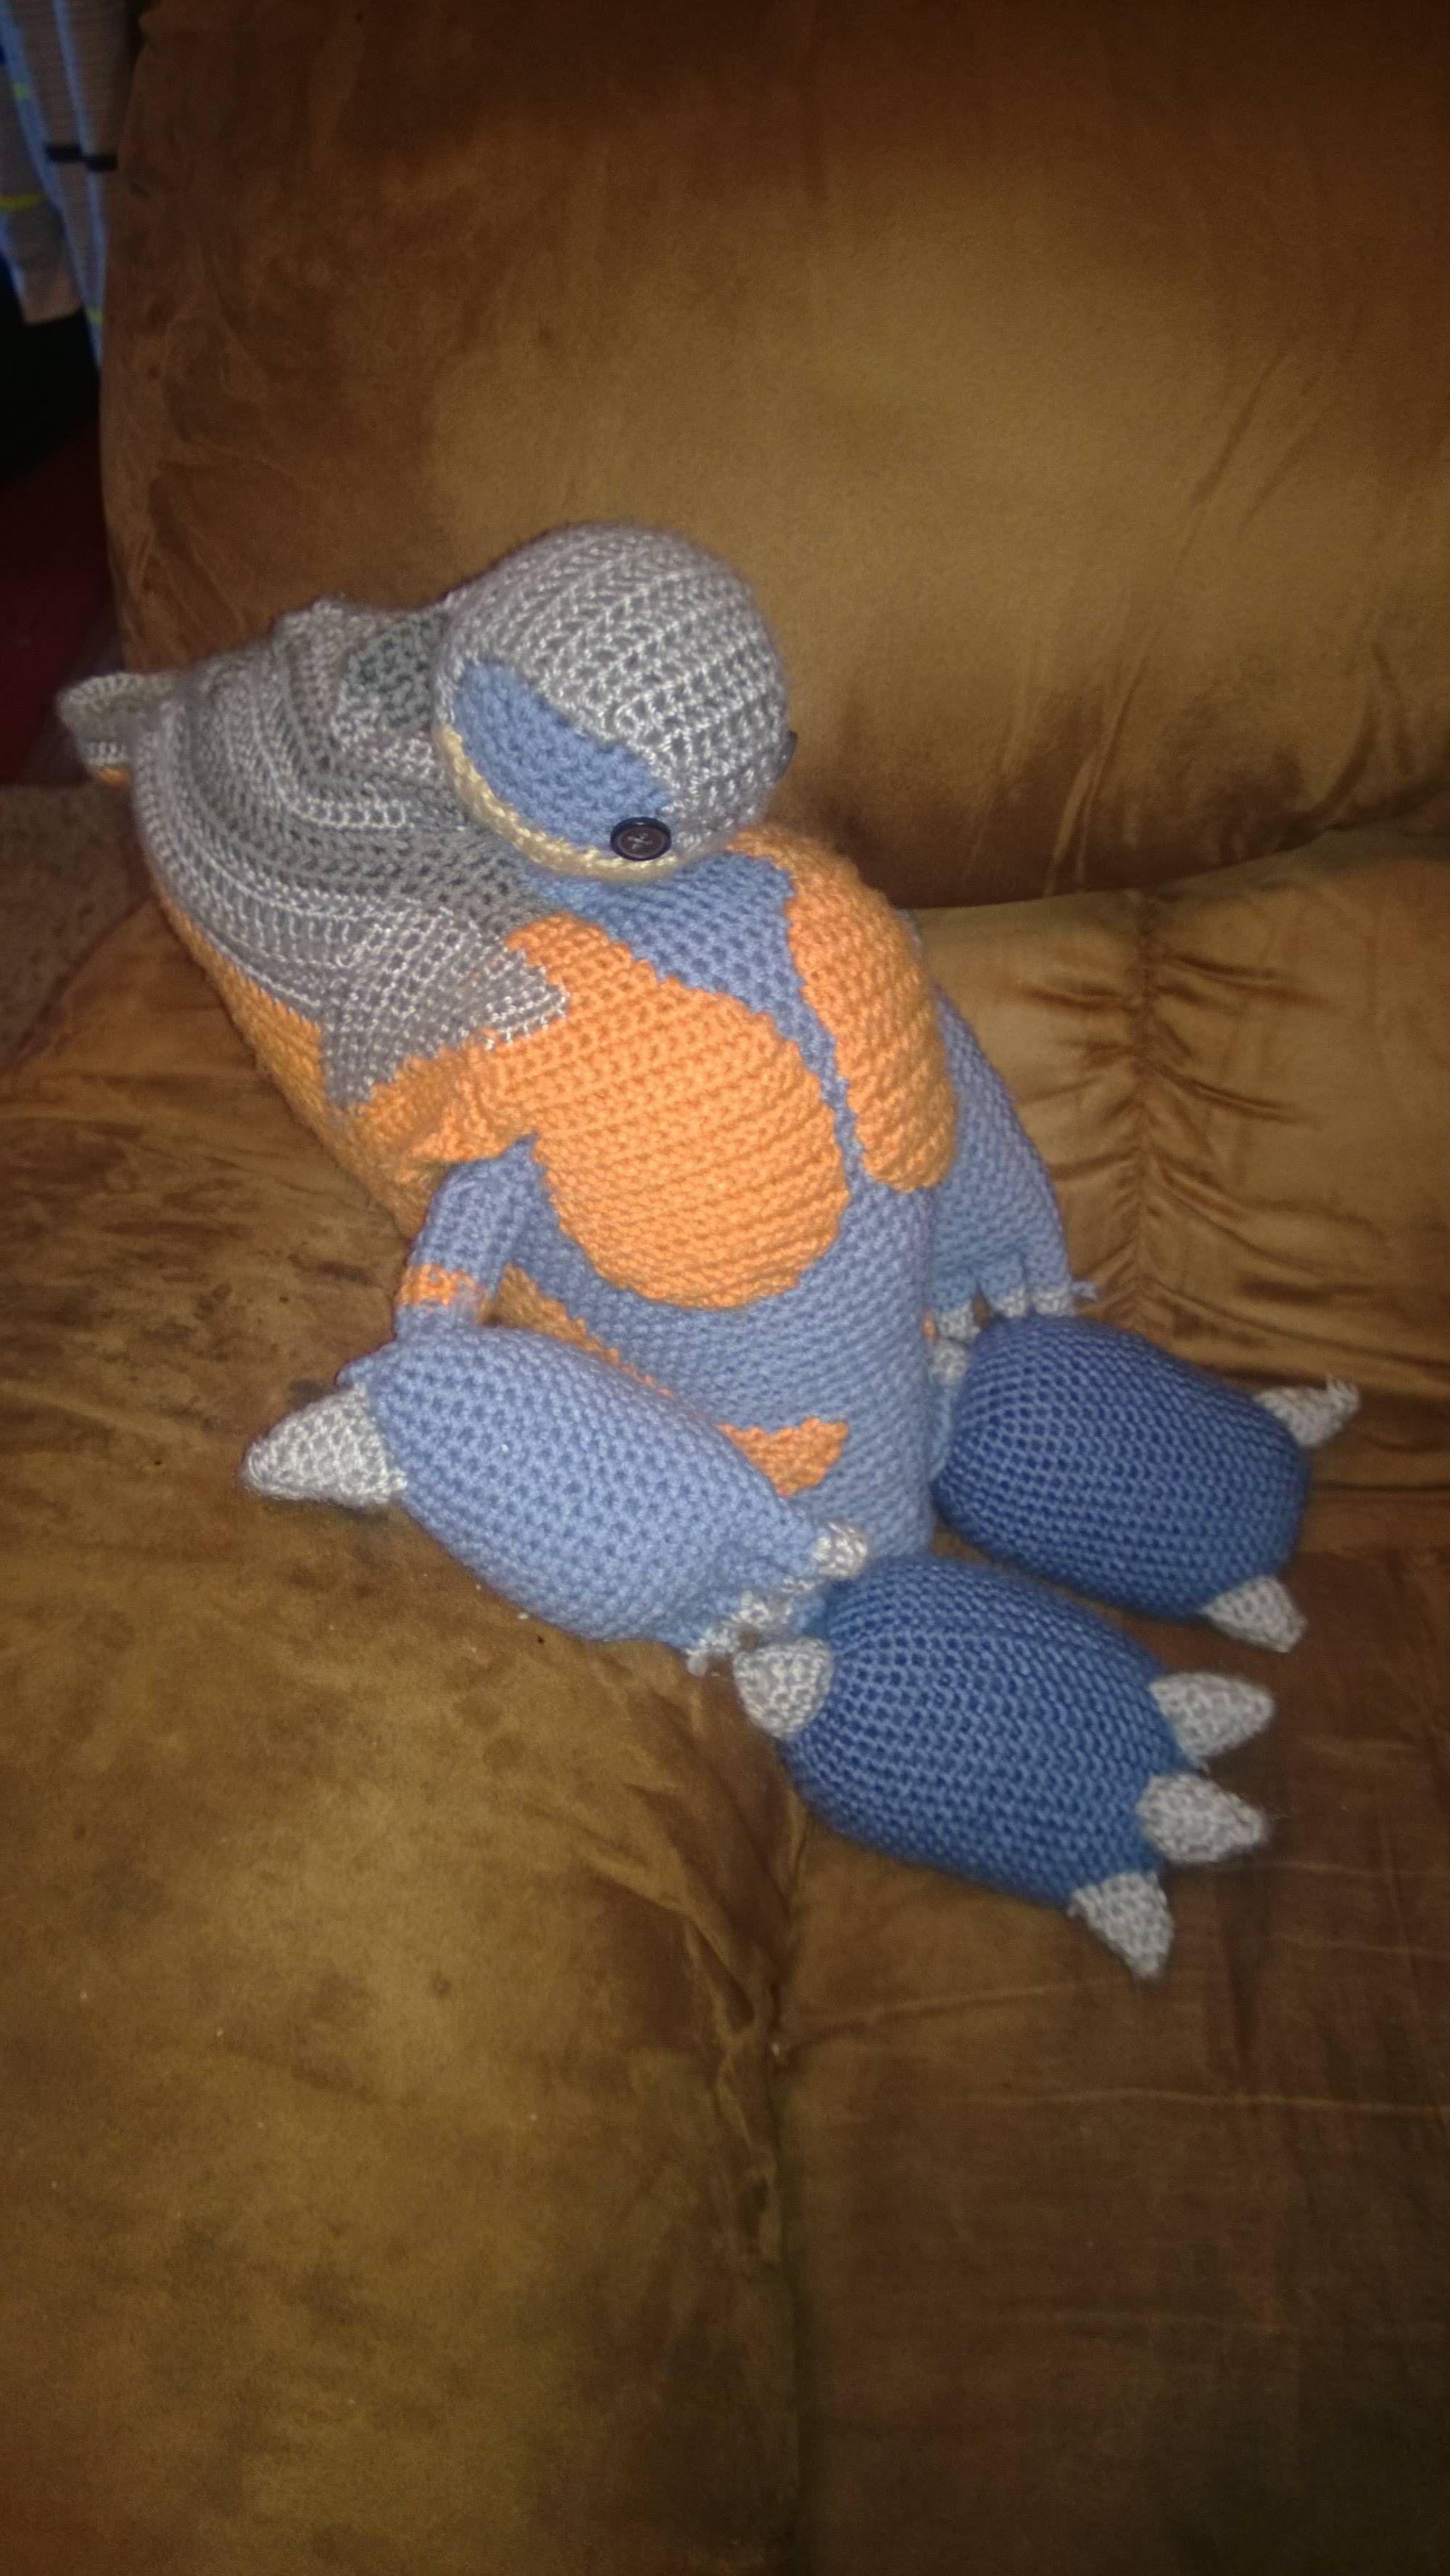 Halo Grunt Doll via Reddit user Parazoan Geek crafts